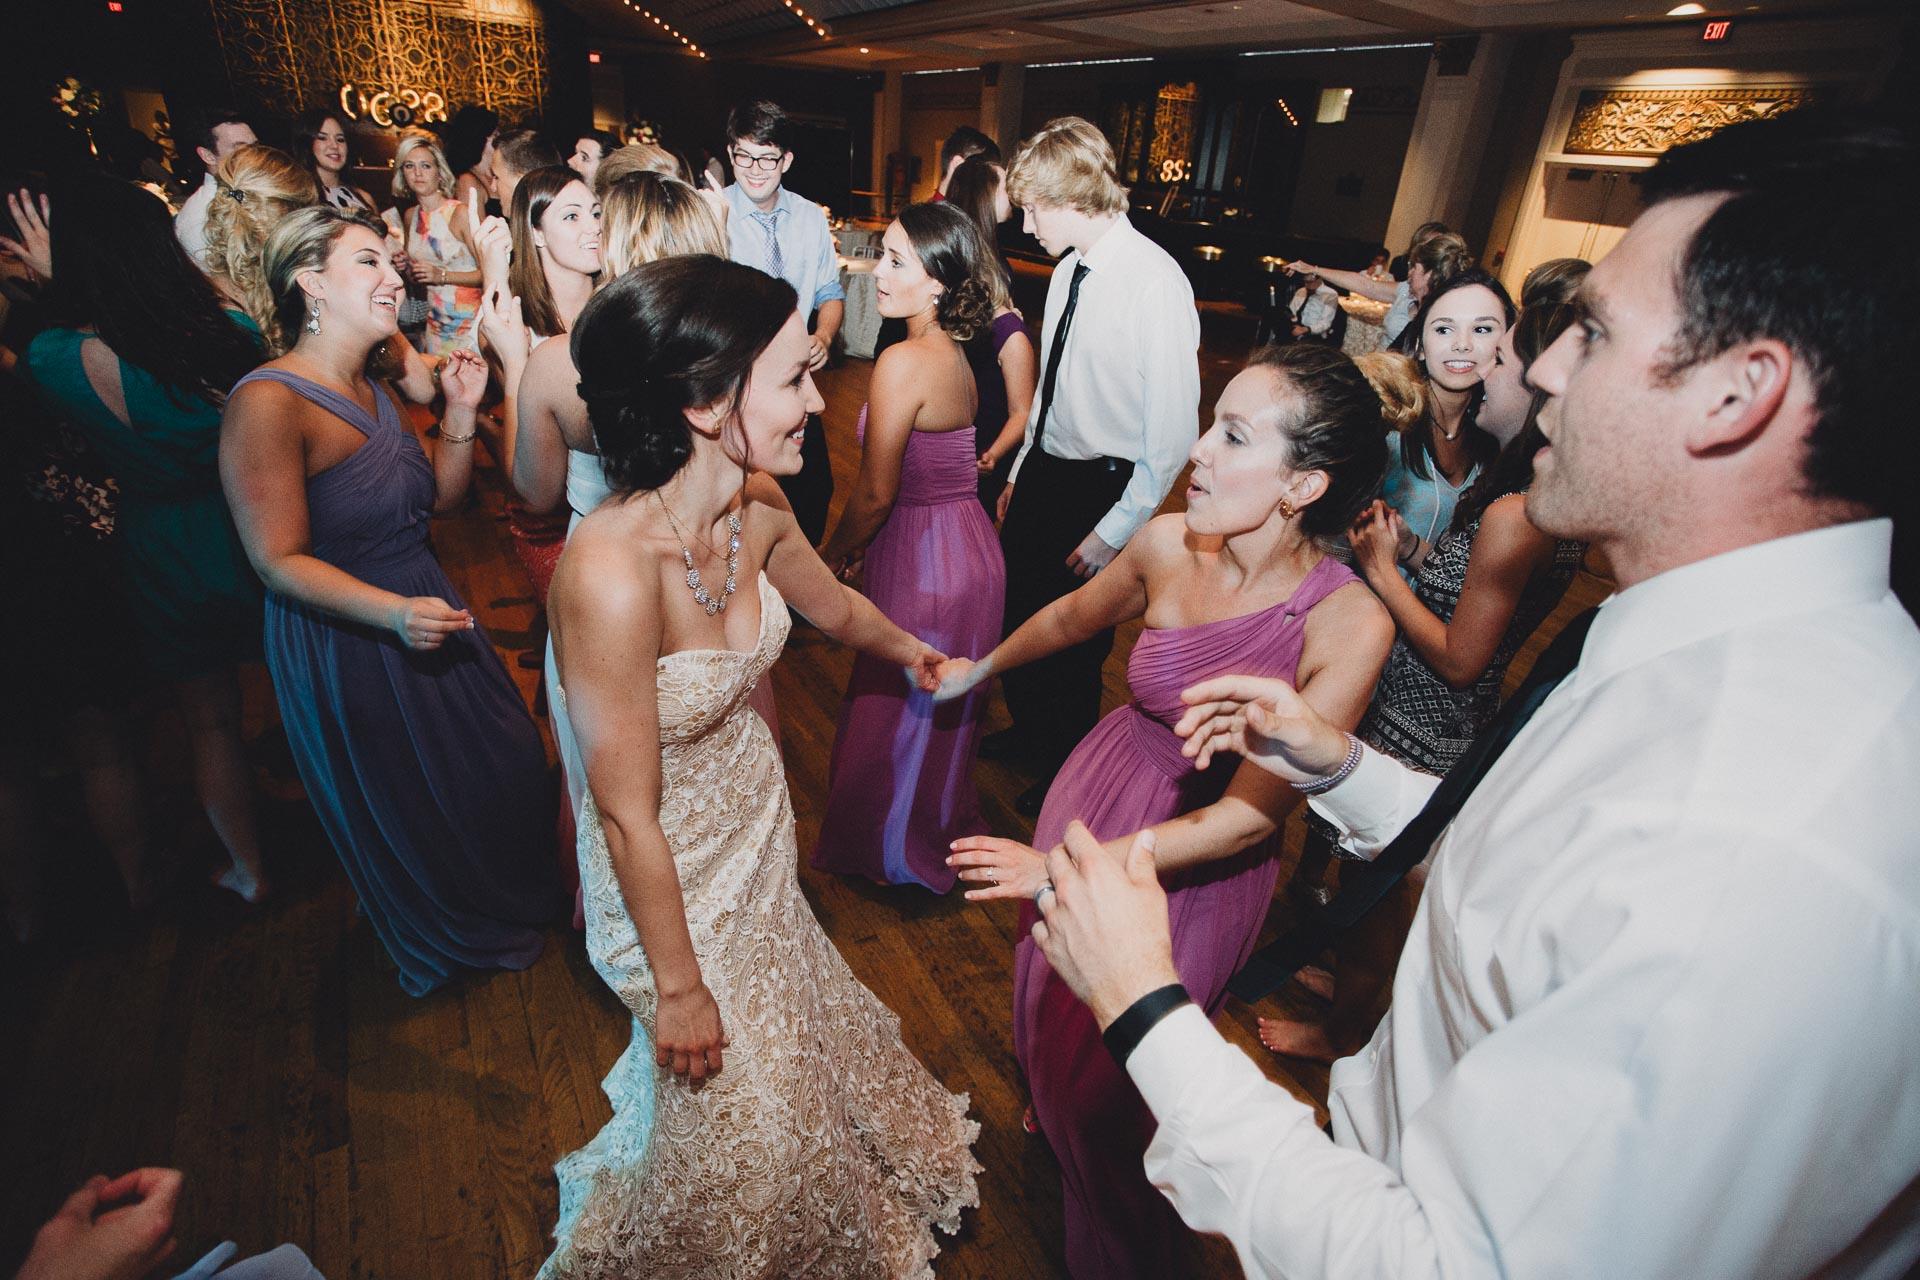 Julia-Michael-Cincinnati-Music-Hall-Wedding-140@2x.jpg